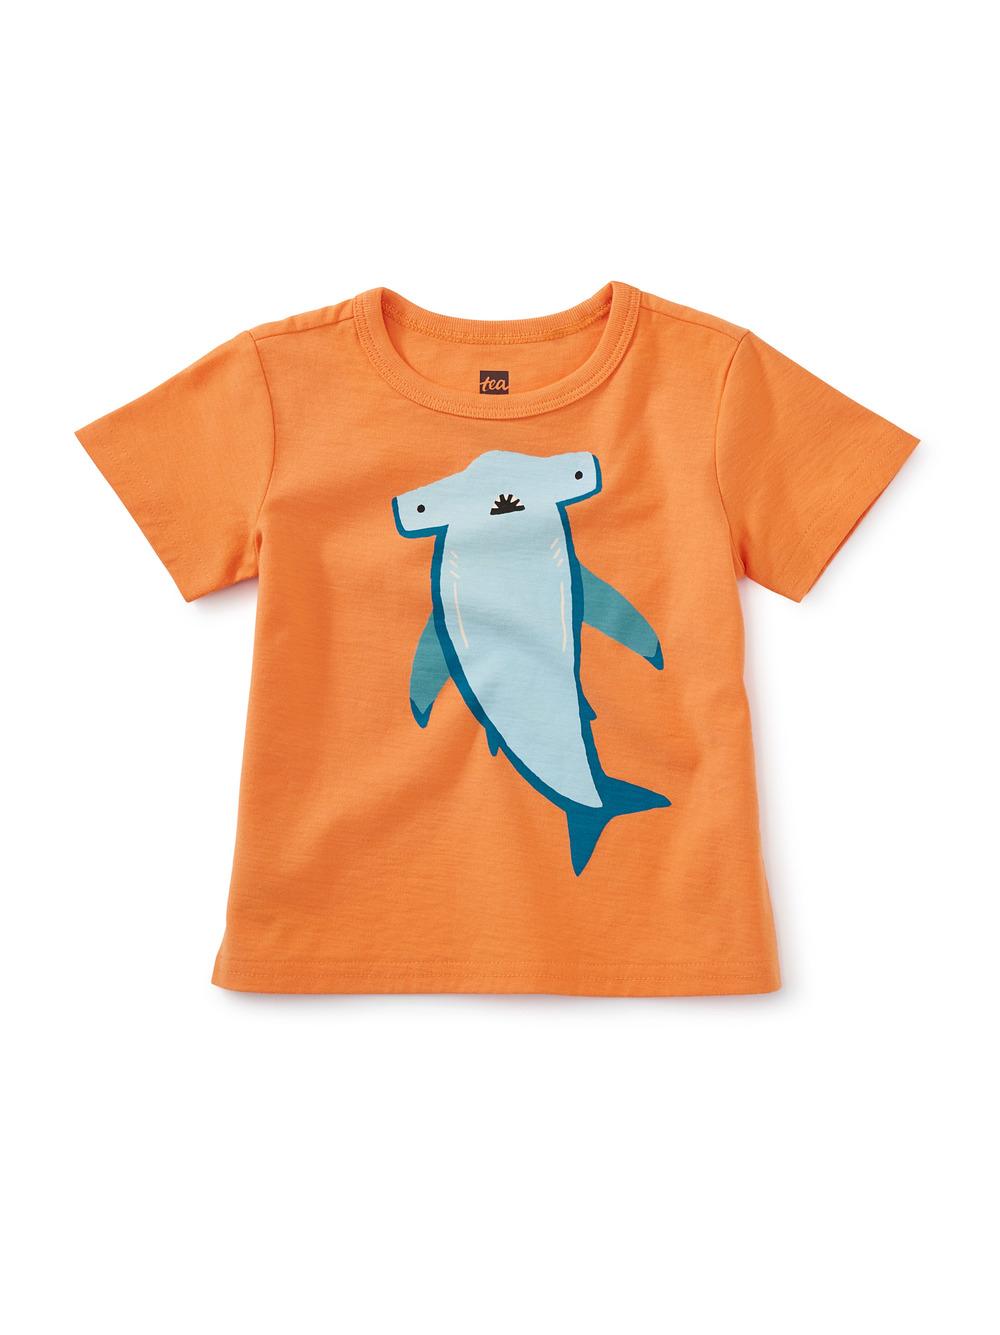 Hammerhead Shark Baby Graphic Tee